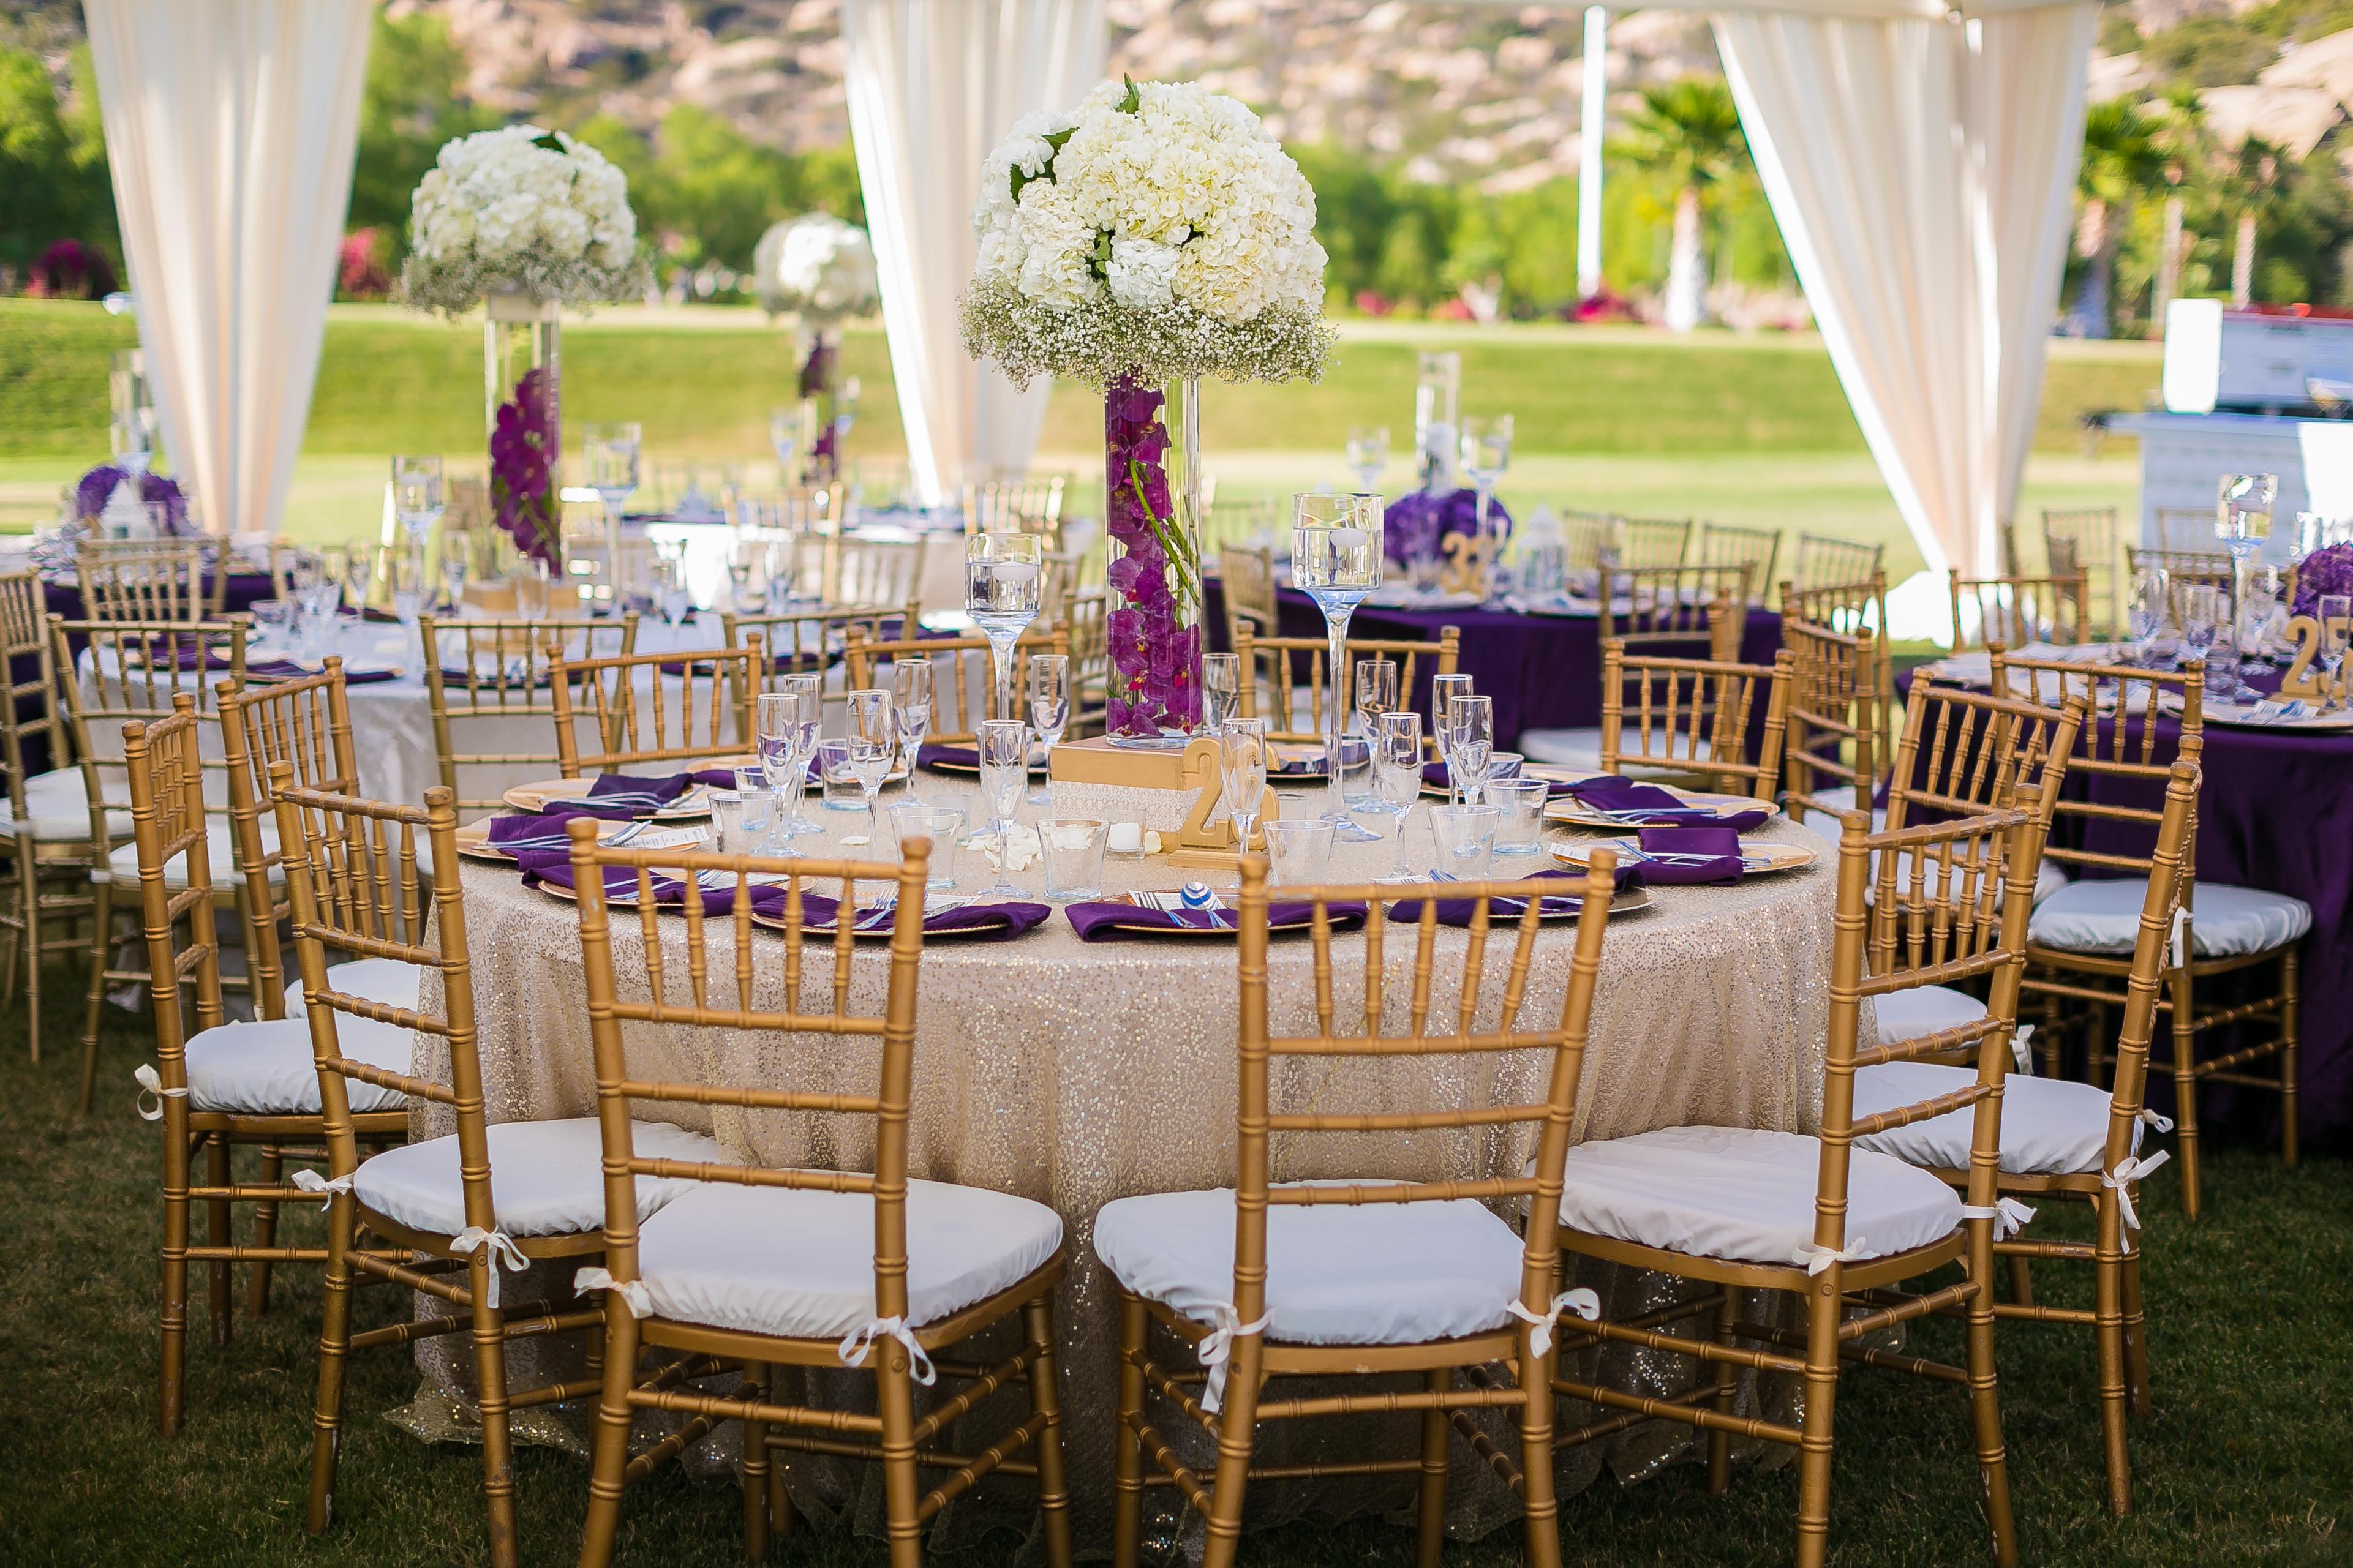 chiavari chairs wedding ceremony outside rocking walmart 19 groomsmen and 8 bridesmaids riddhi amish